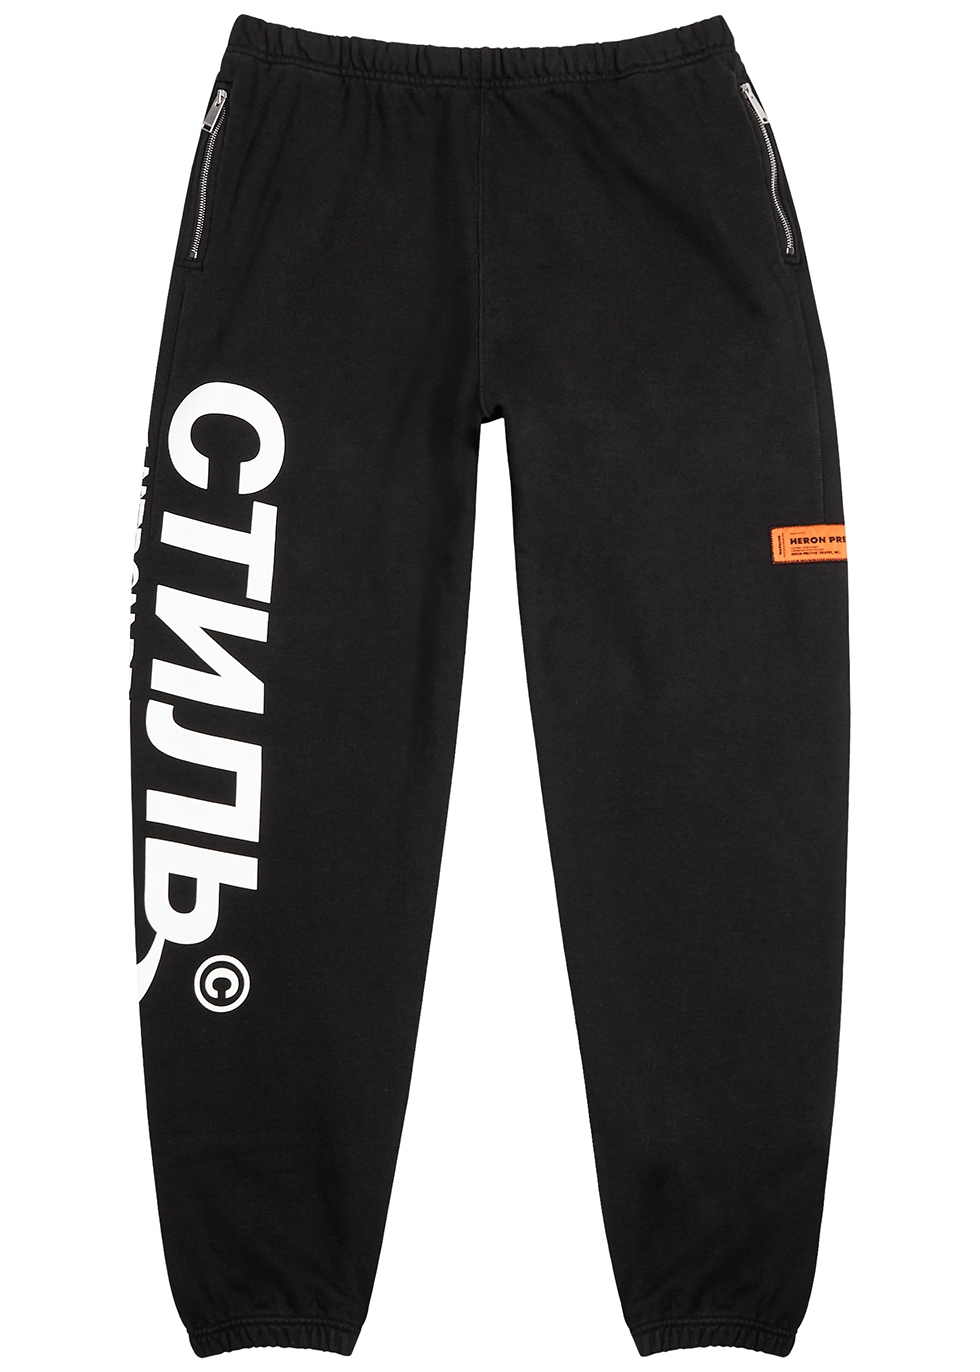 CTNMB black cotton sweatpants